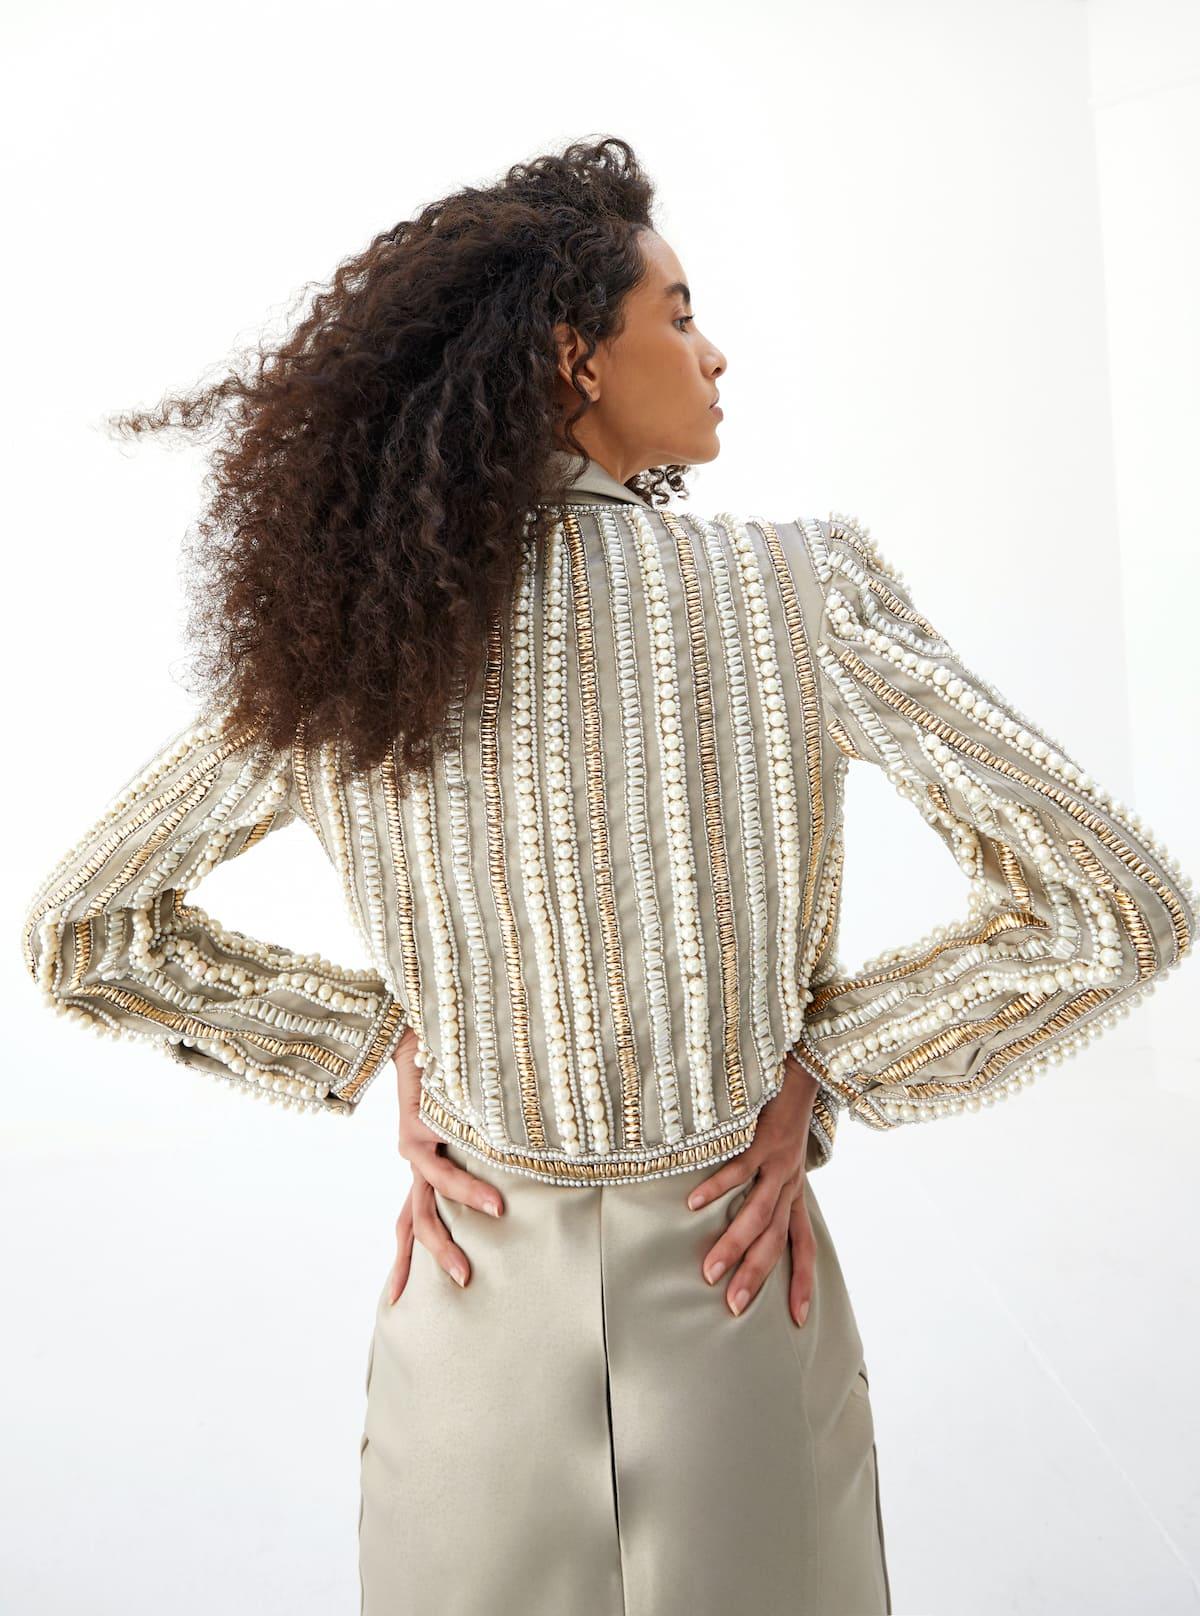 View 3 of model wearing Kaysa Blazer in pearl gold.